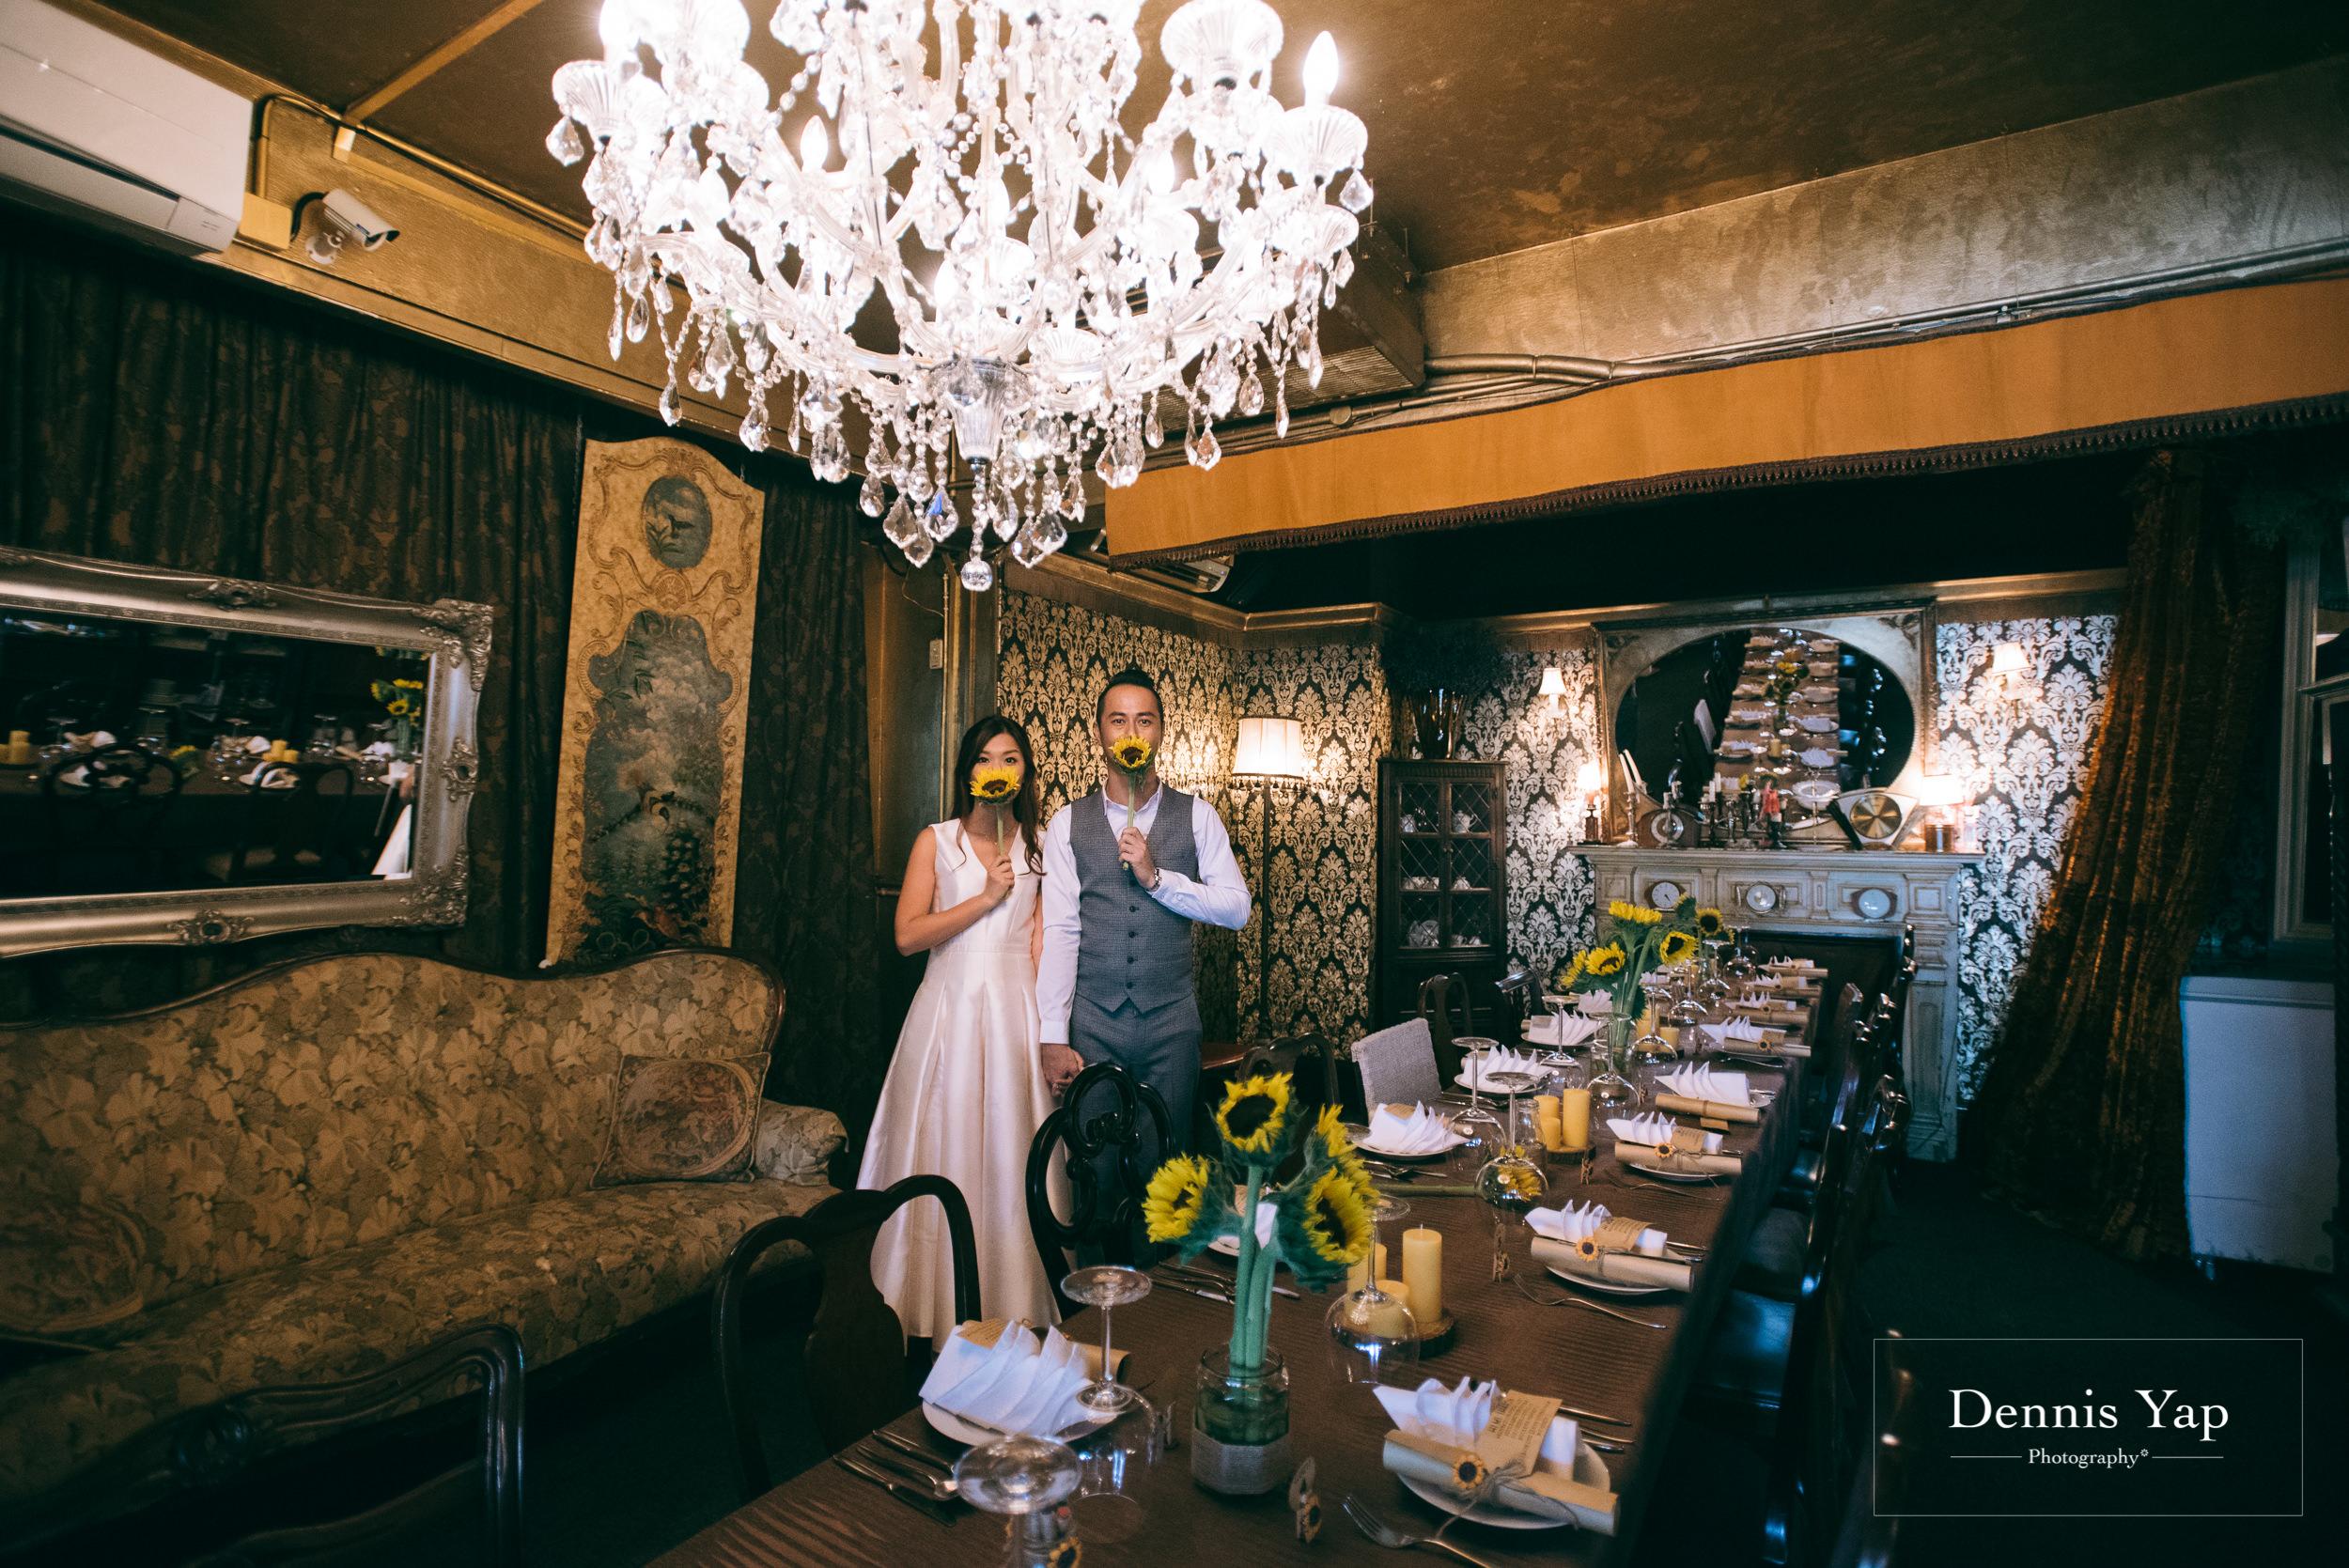 patrick samantha surprise wedding party cafe cafe kuala lumpur dennis yap photography-5.jpg